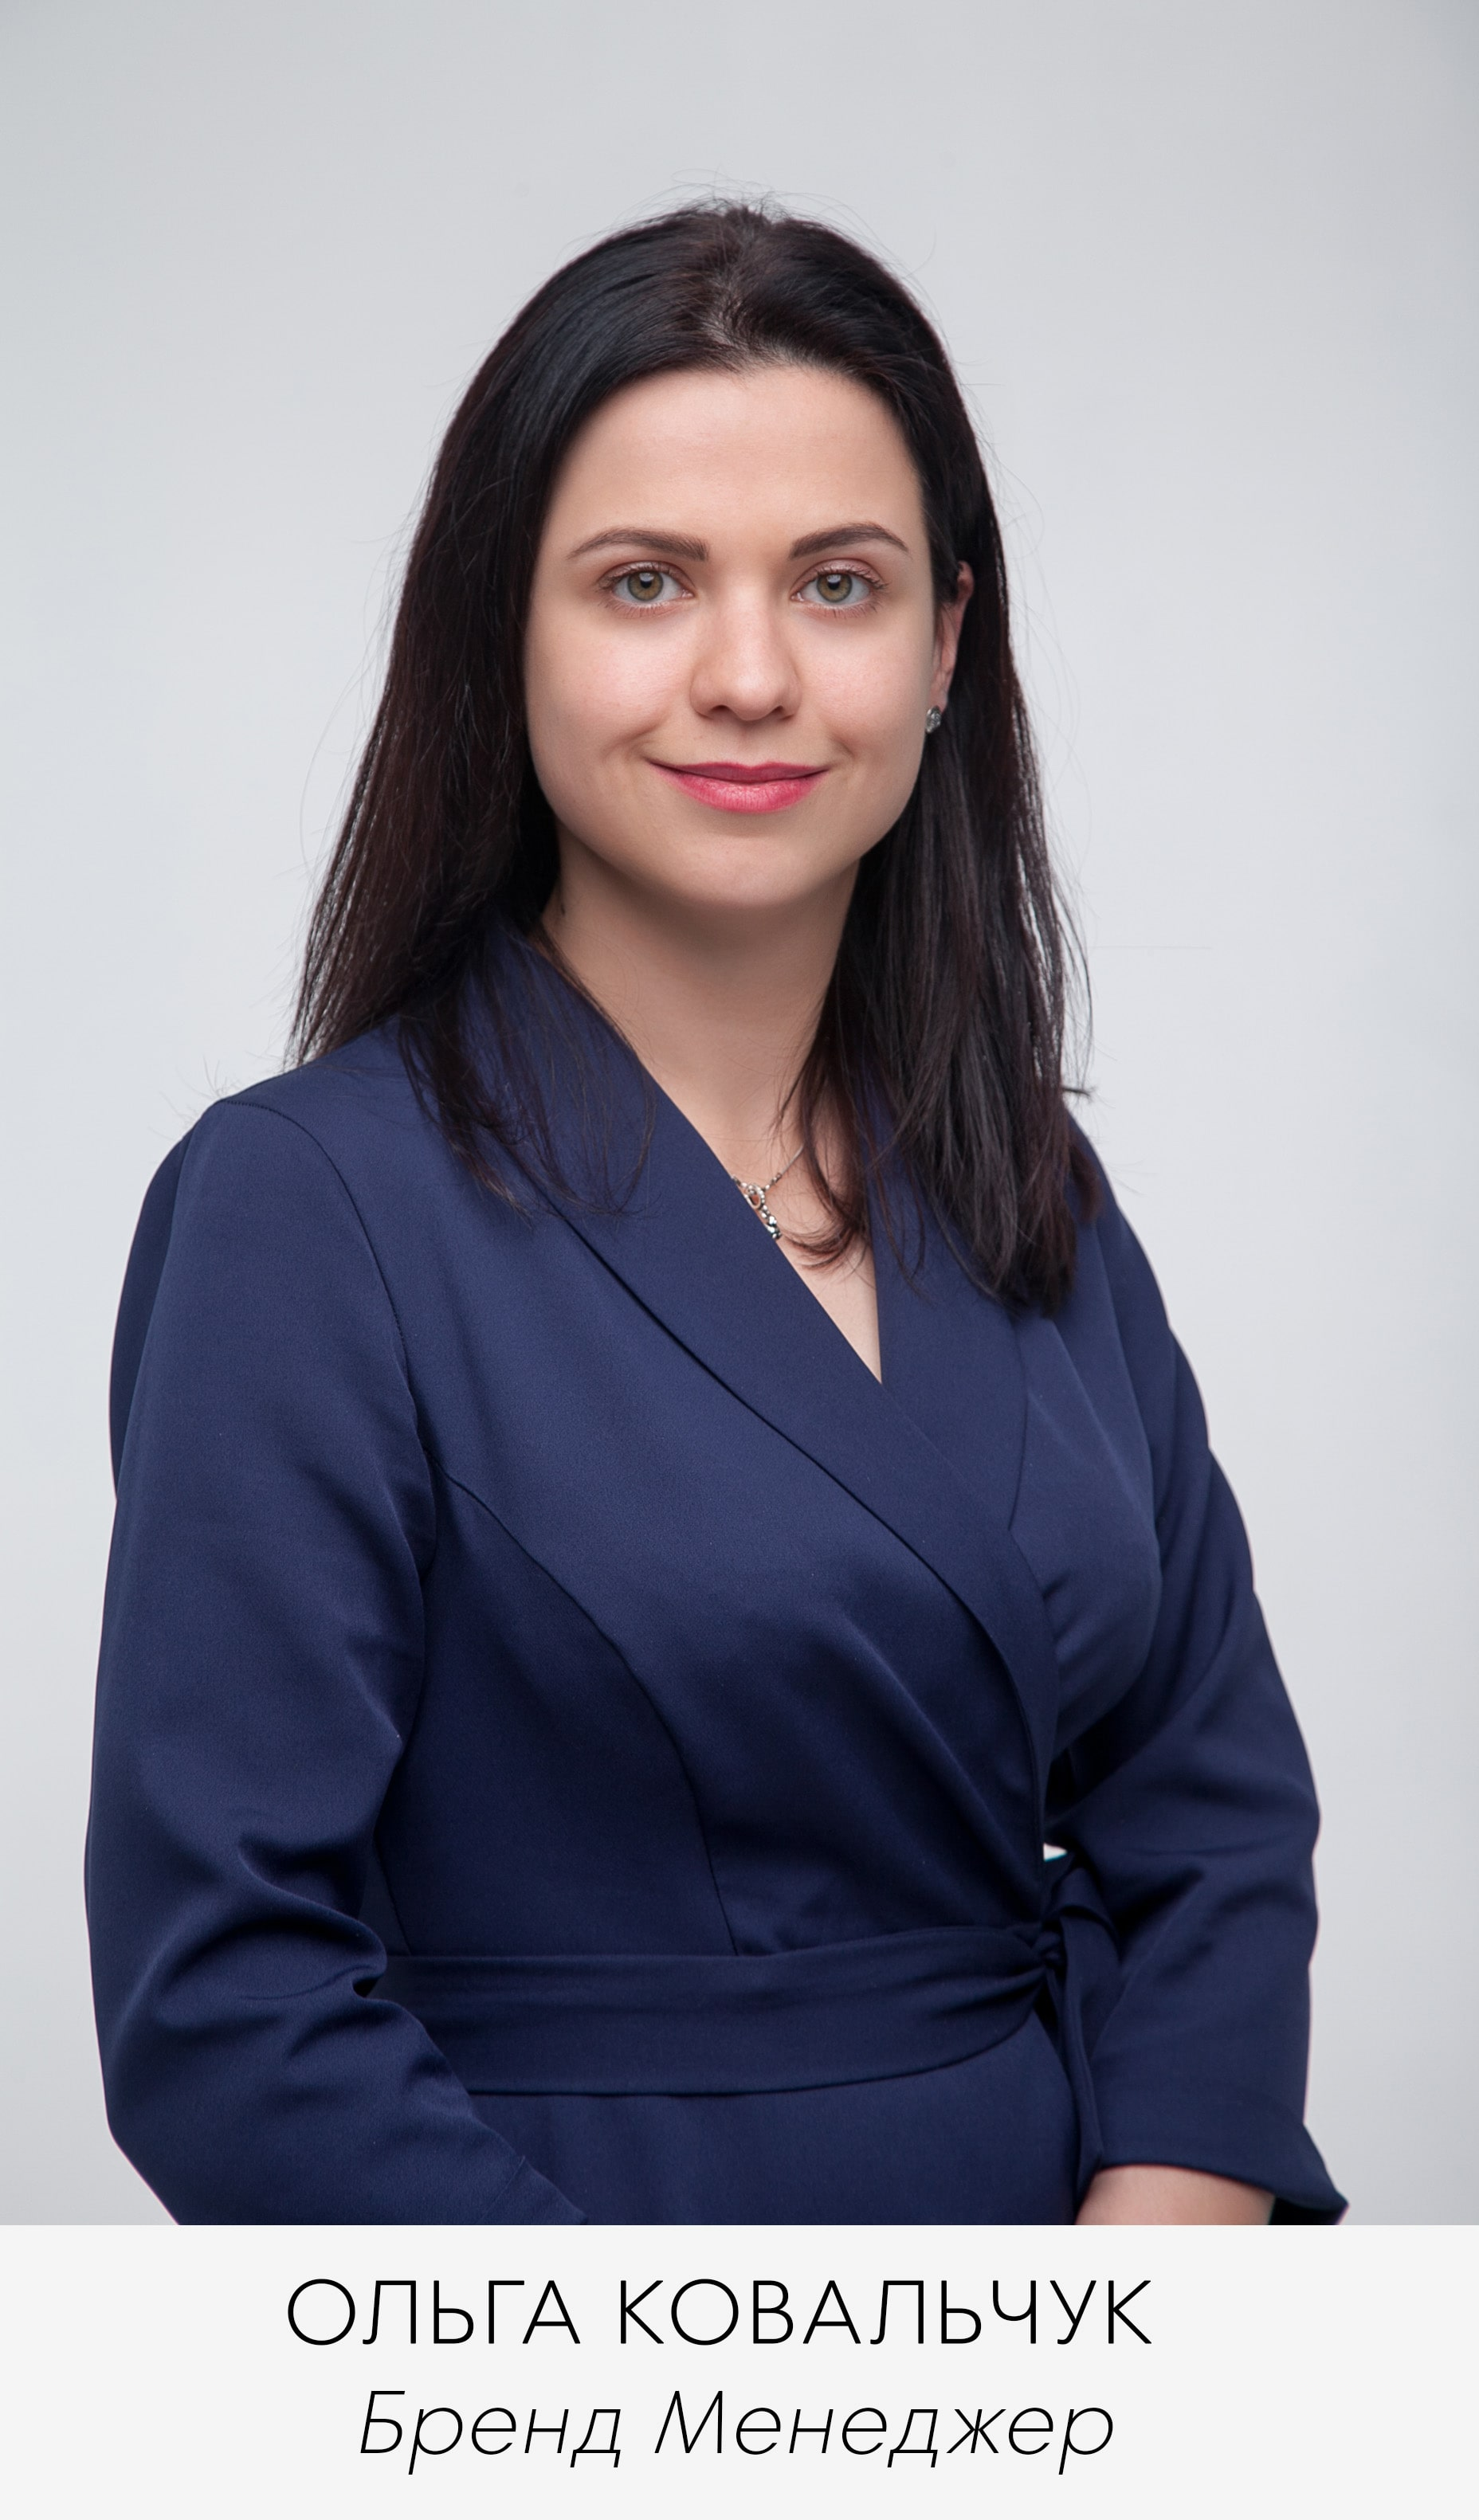 Olga-Kovalchuk-brand-manager-1-min.jpg